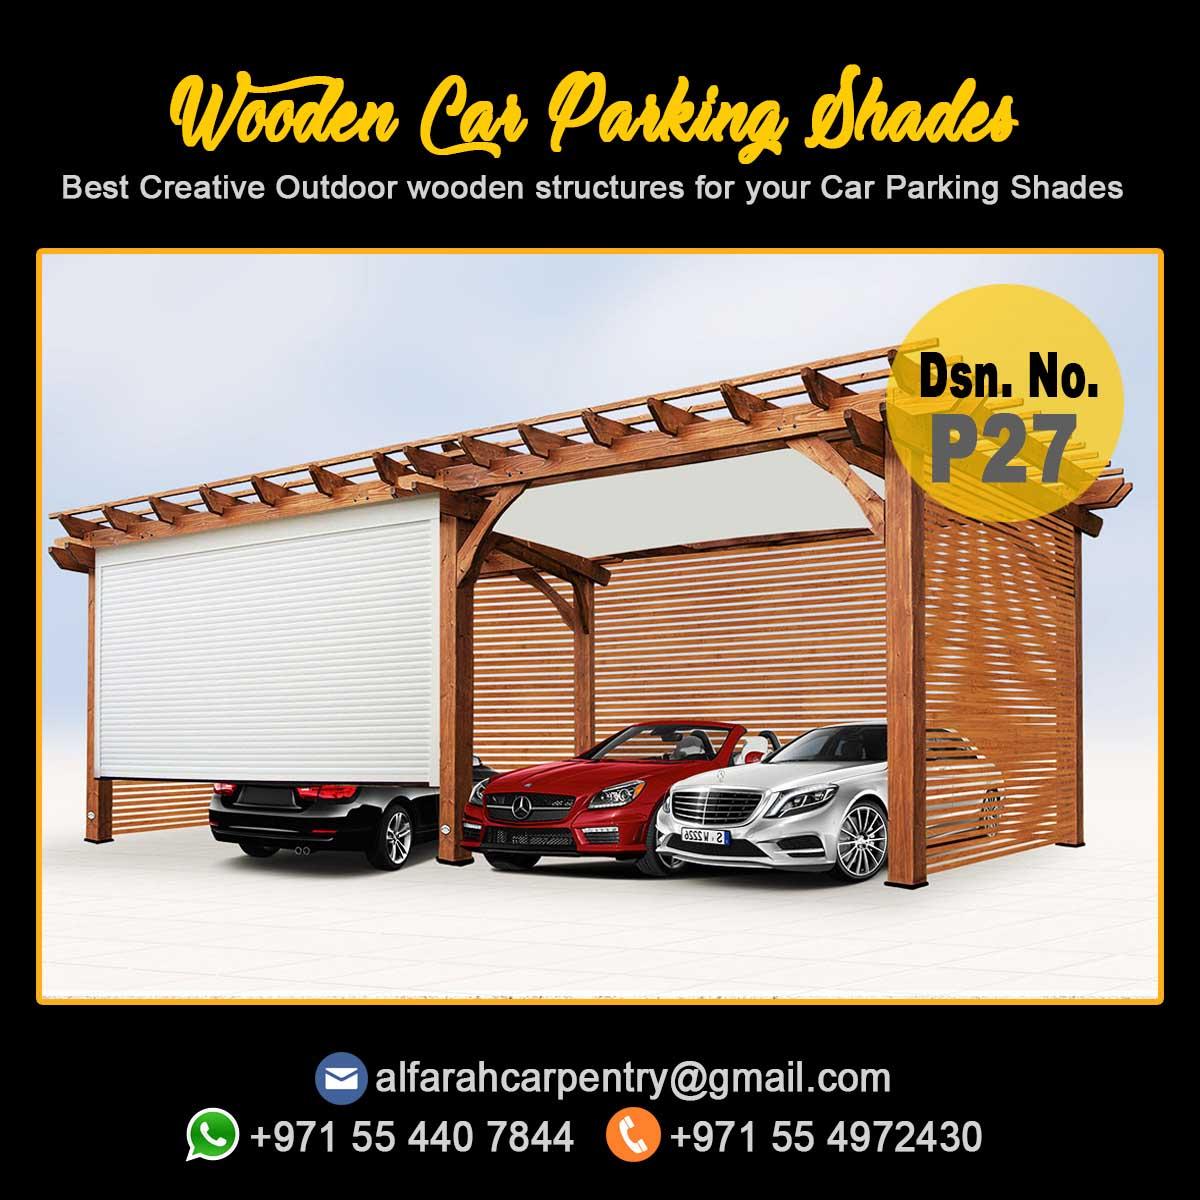 Car Parking Pergola Suppliers , Wooden car Parking , Car parking Wooden Shades Dubai3.jpg